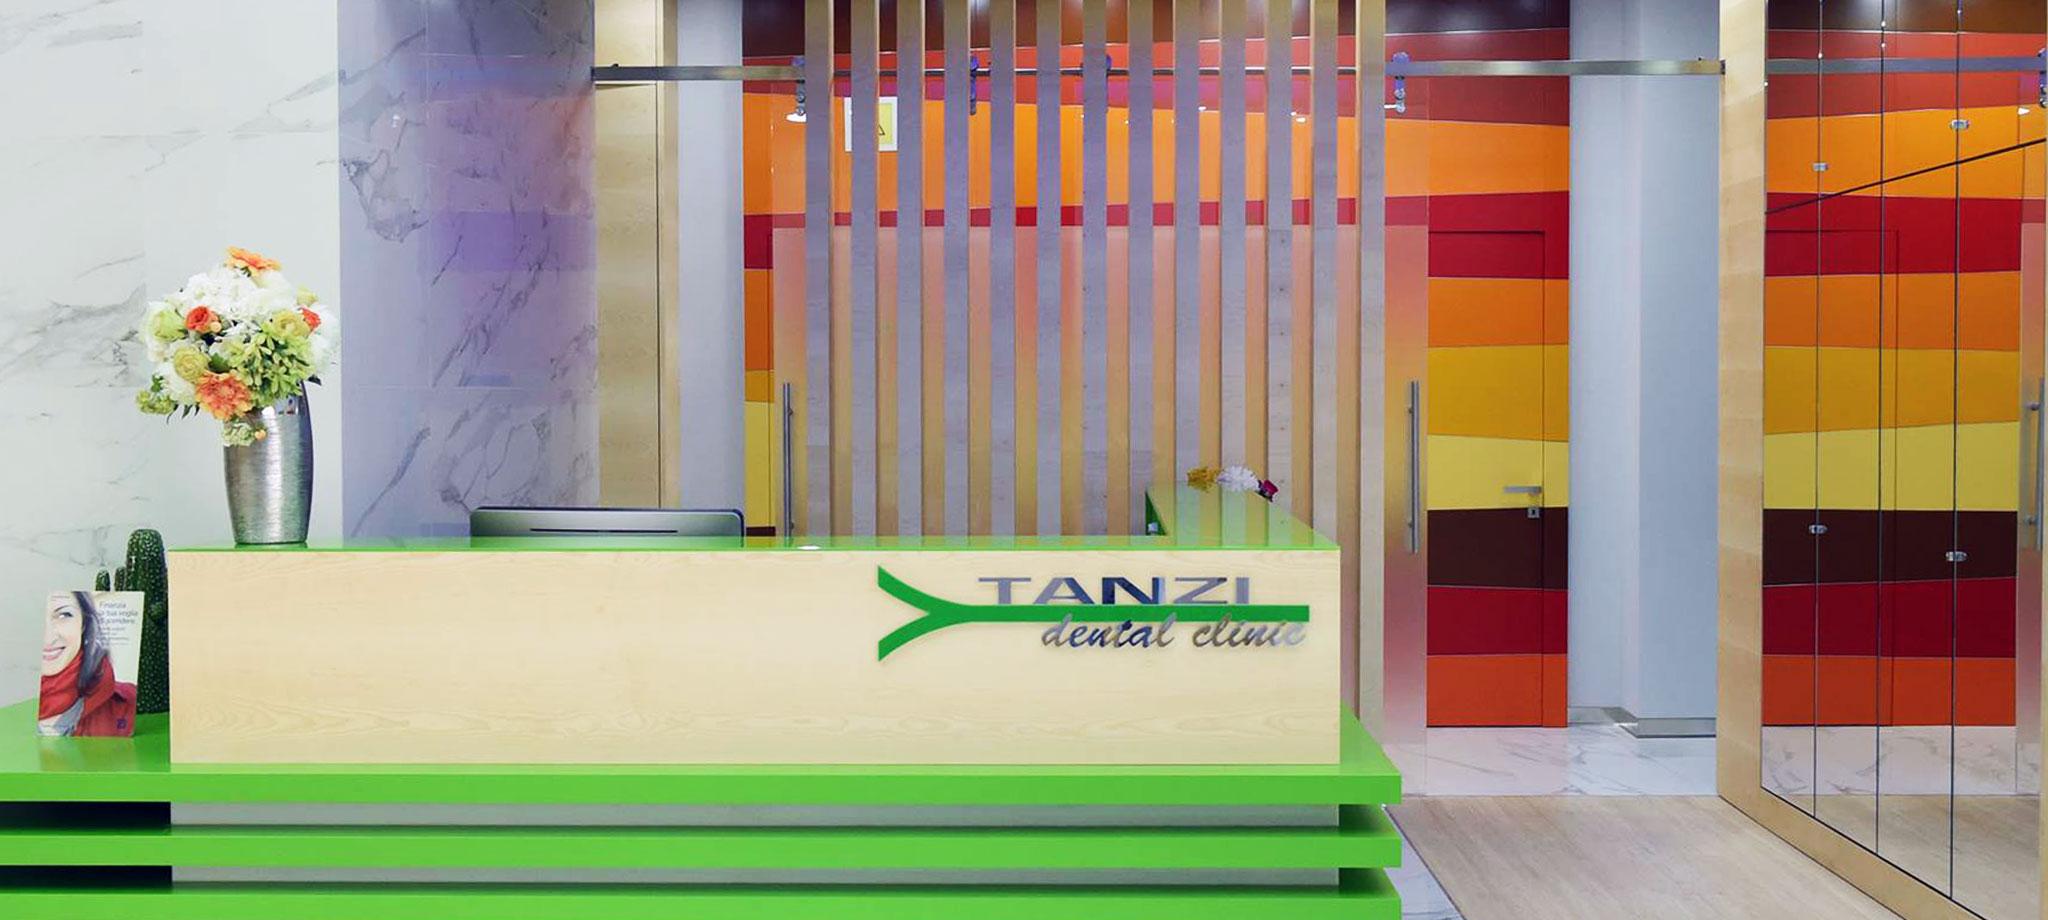 Tanzi Dental Clinic - Studio dentistico a Santa Maria Capua Vetere